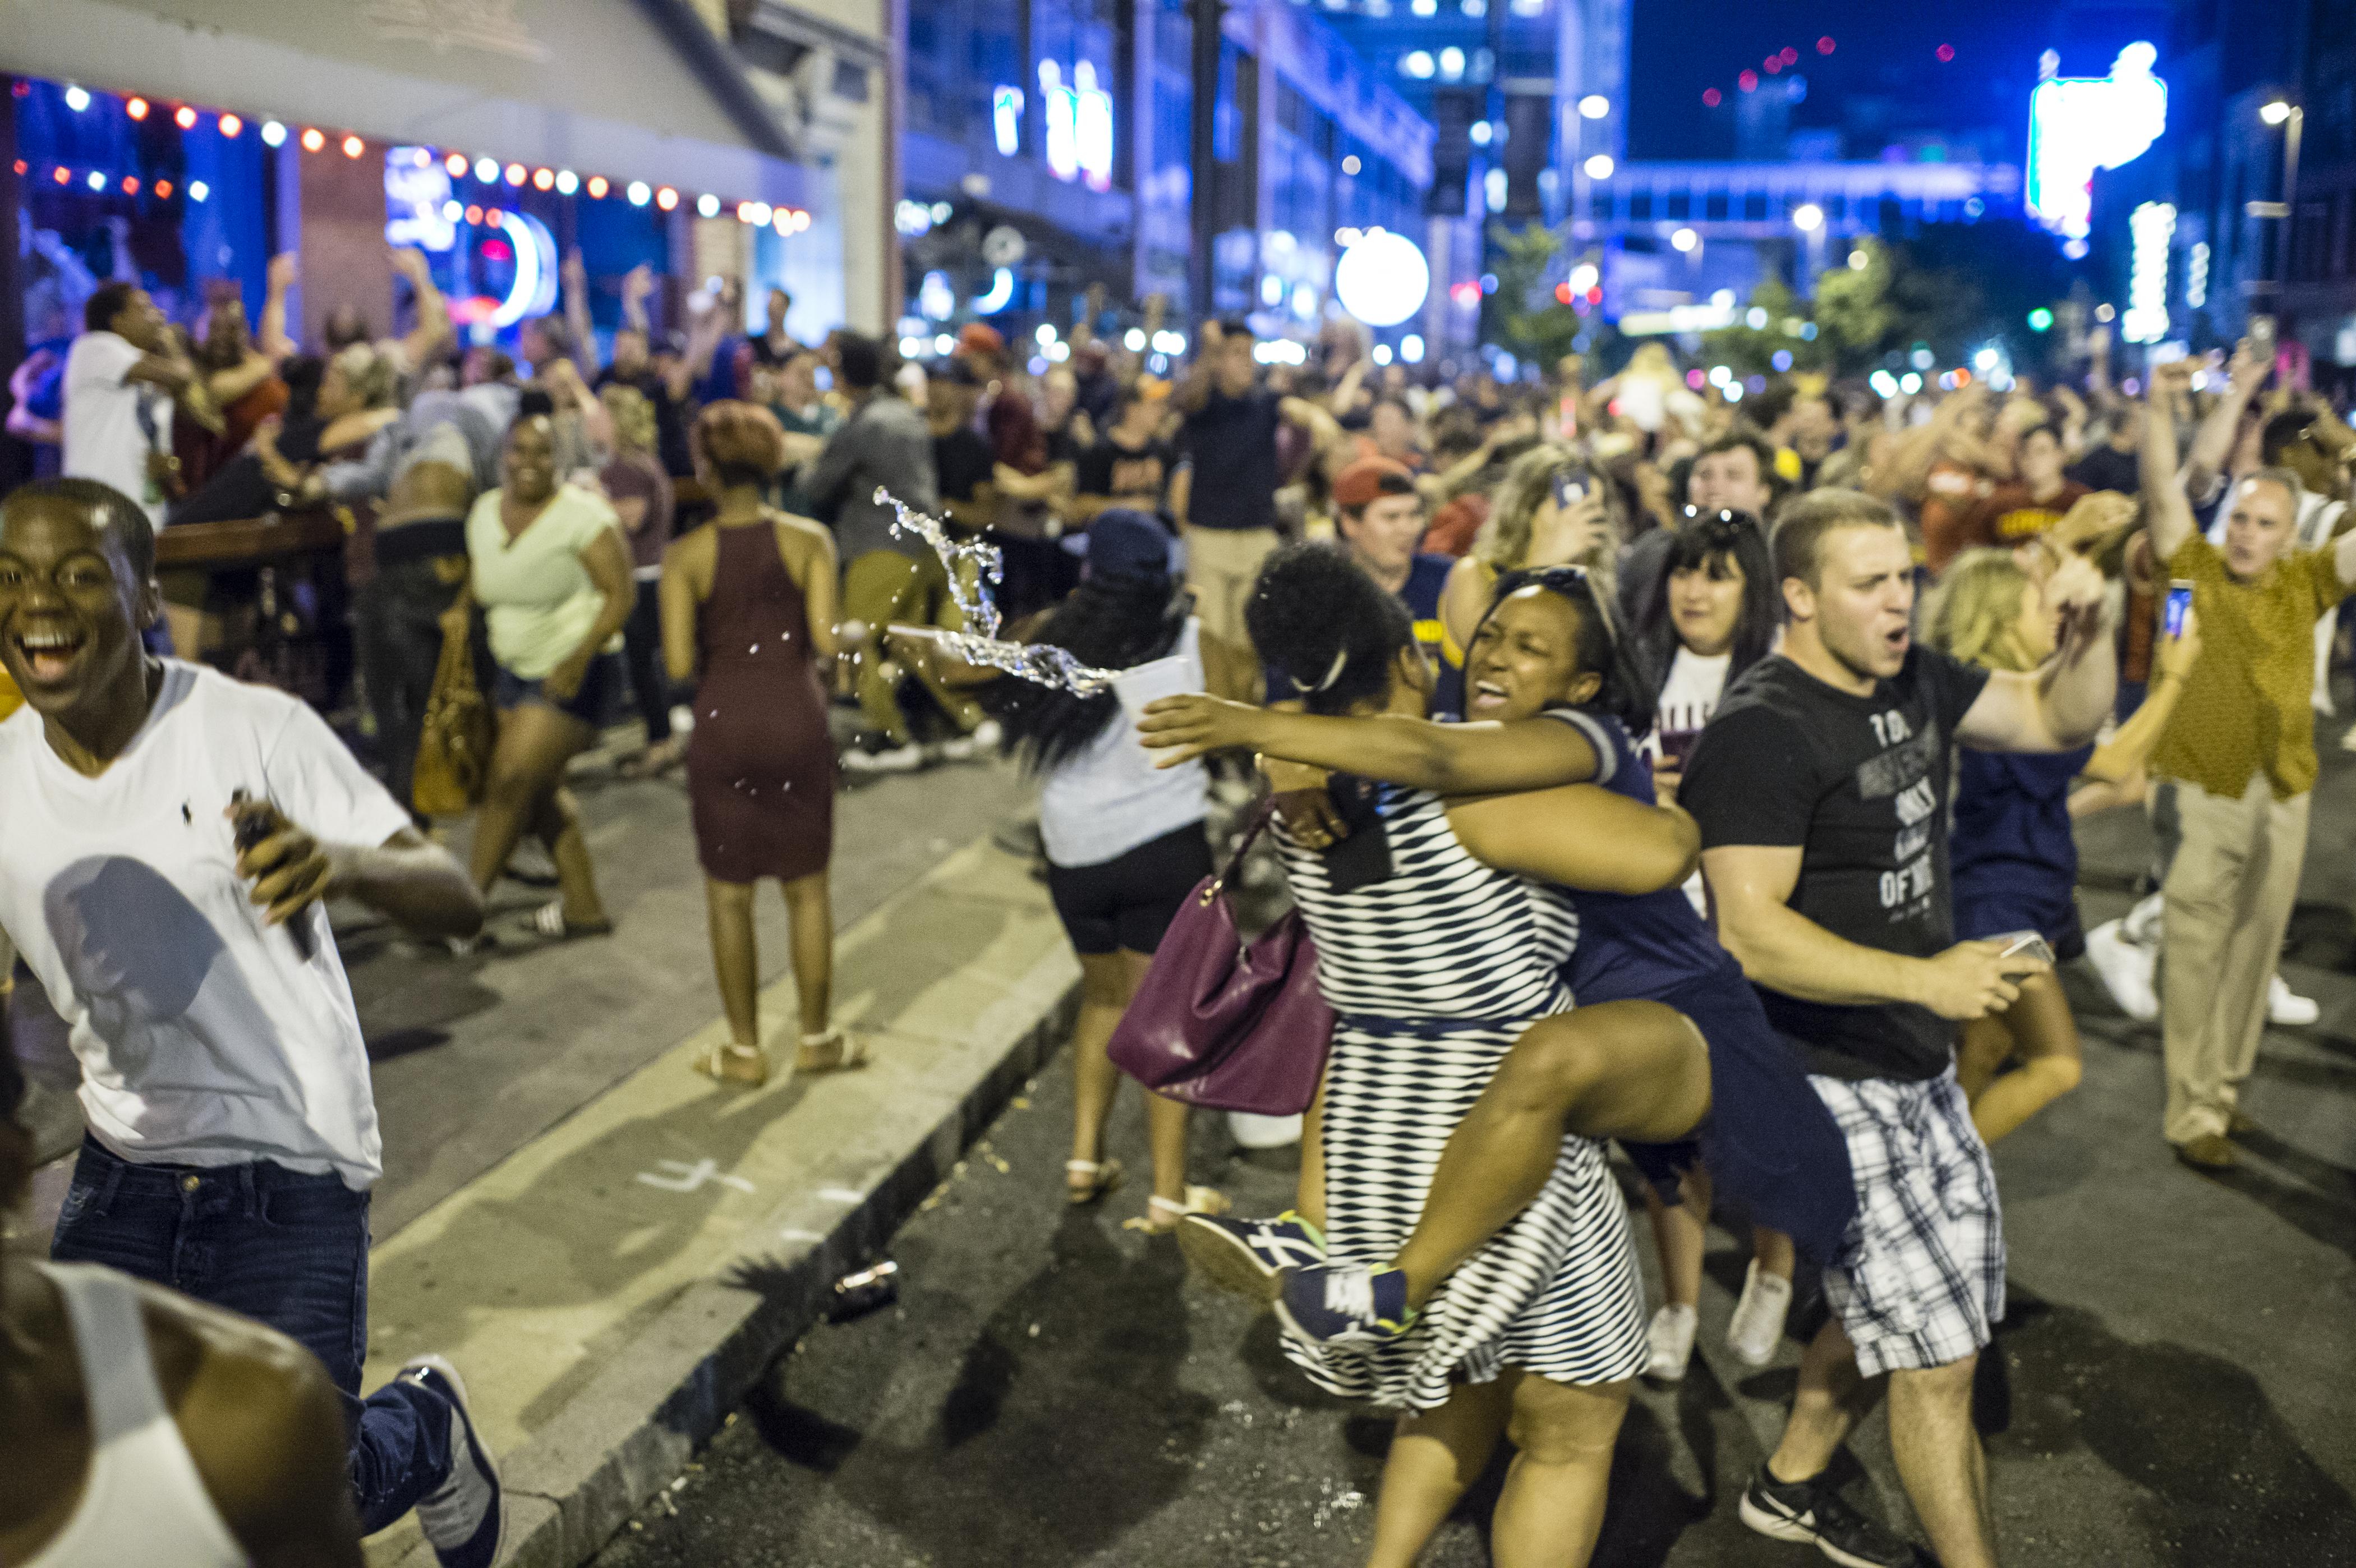 Cleveland fans rock with glee after Cavs win NBA Finals - CBS News